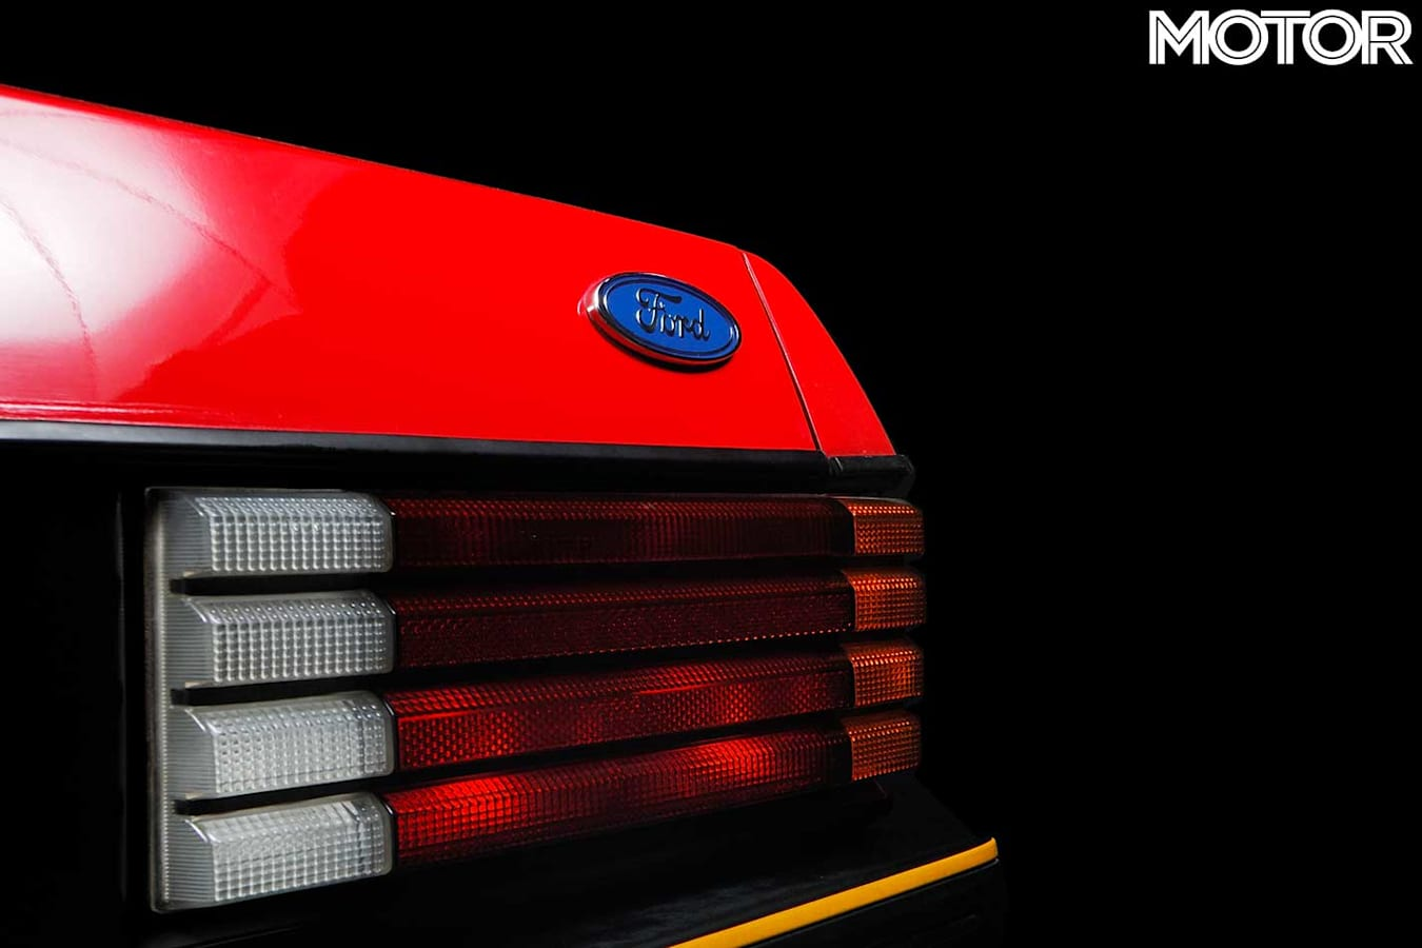 1982 Ford Falcon XE ESP Rear Badge Jpg